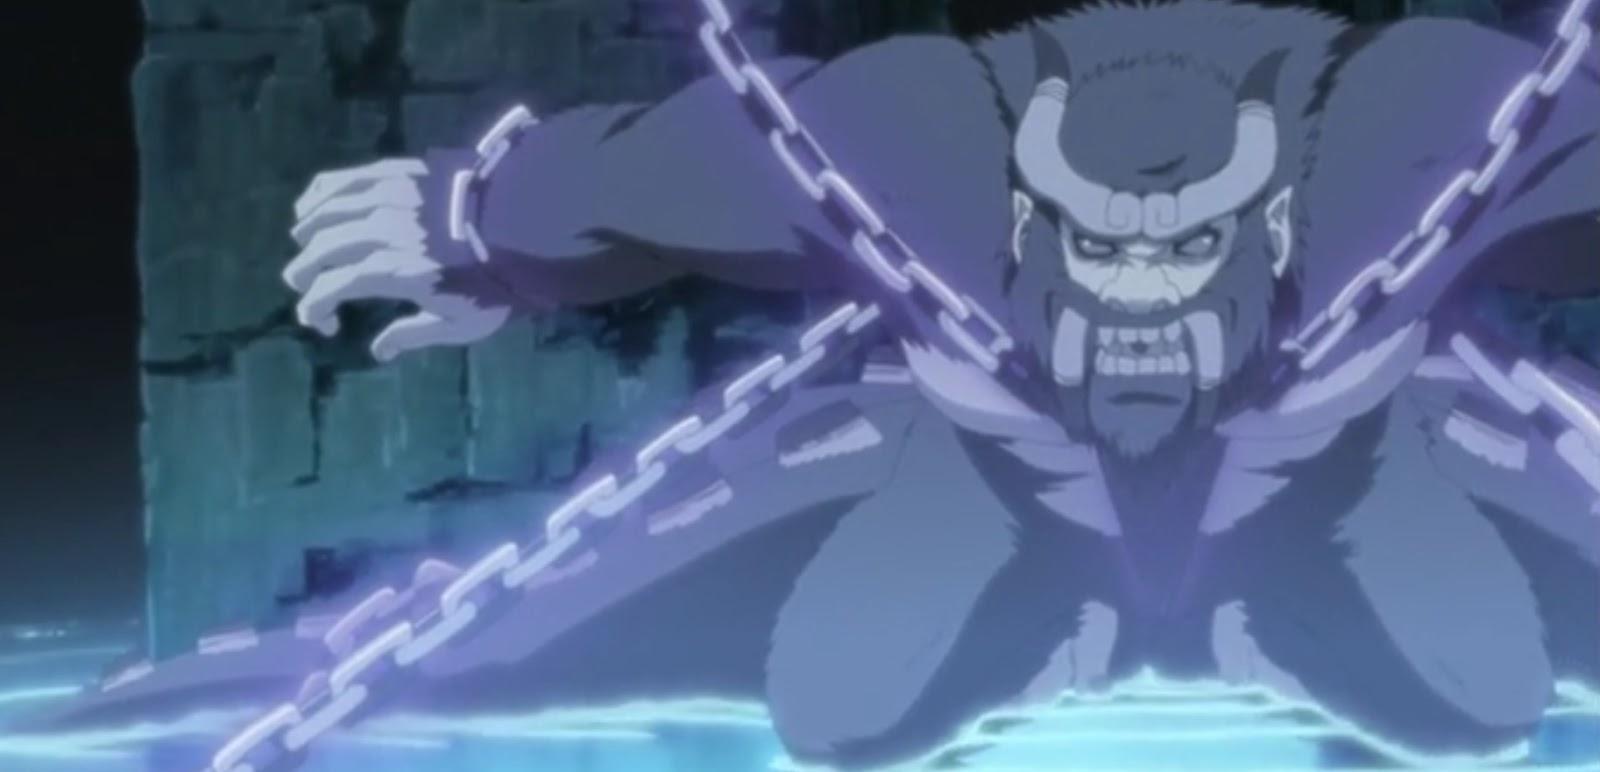 Naruto Shippuden: Episódio 326 – Quatro Caudas: O Eremita Rei dos Macacos